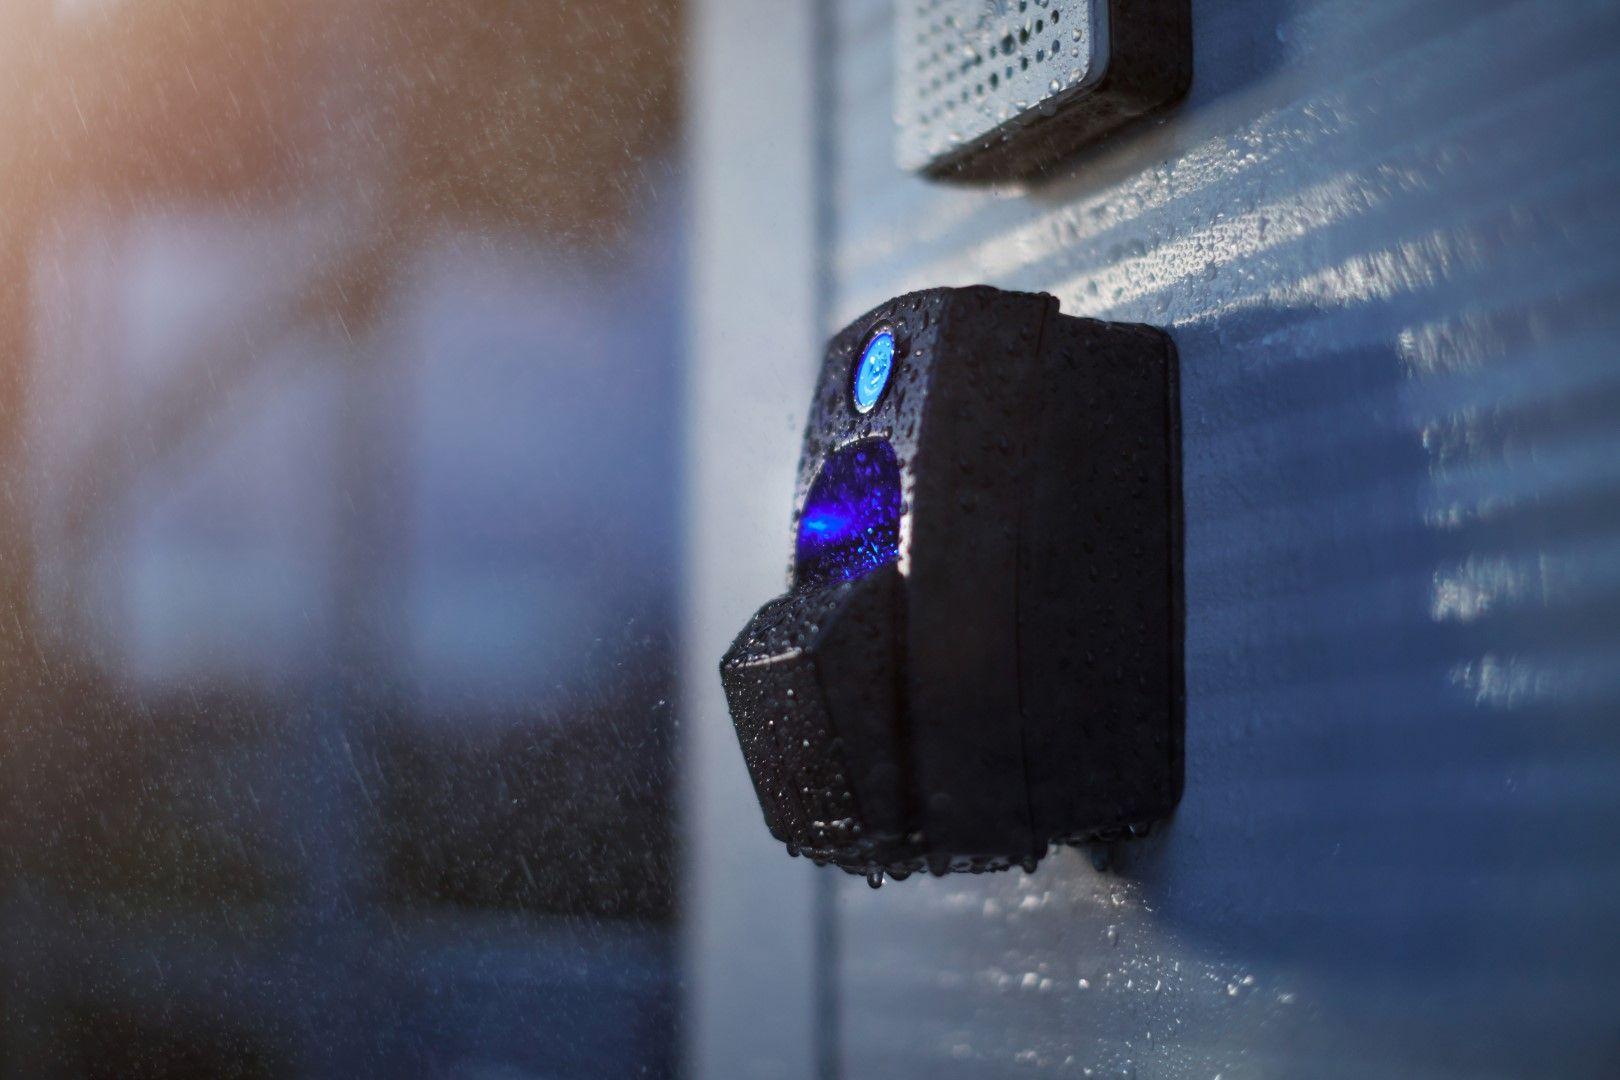 ievo Biometrics - Why Multispectral Fingerprint Imaging?